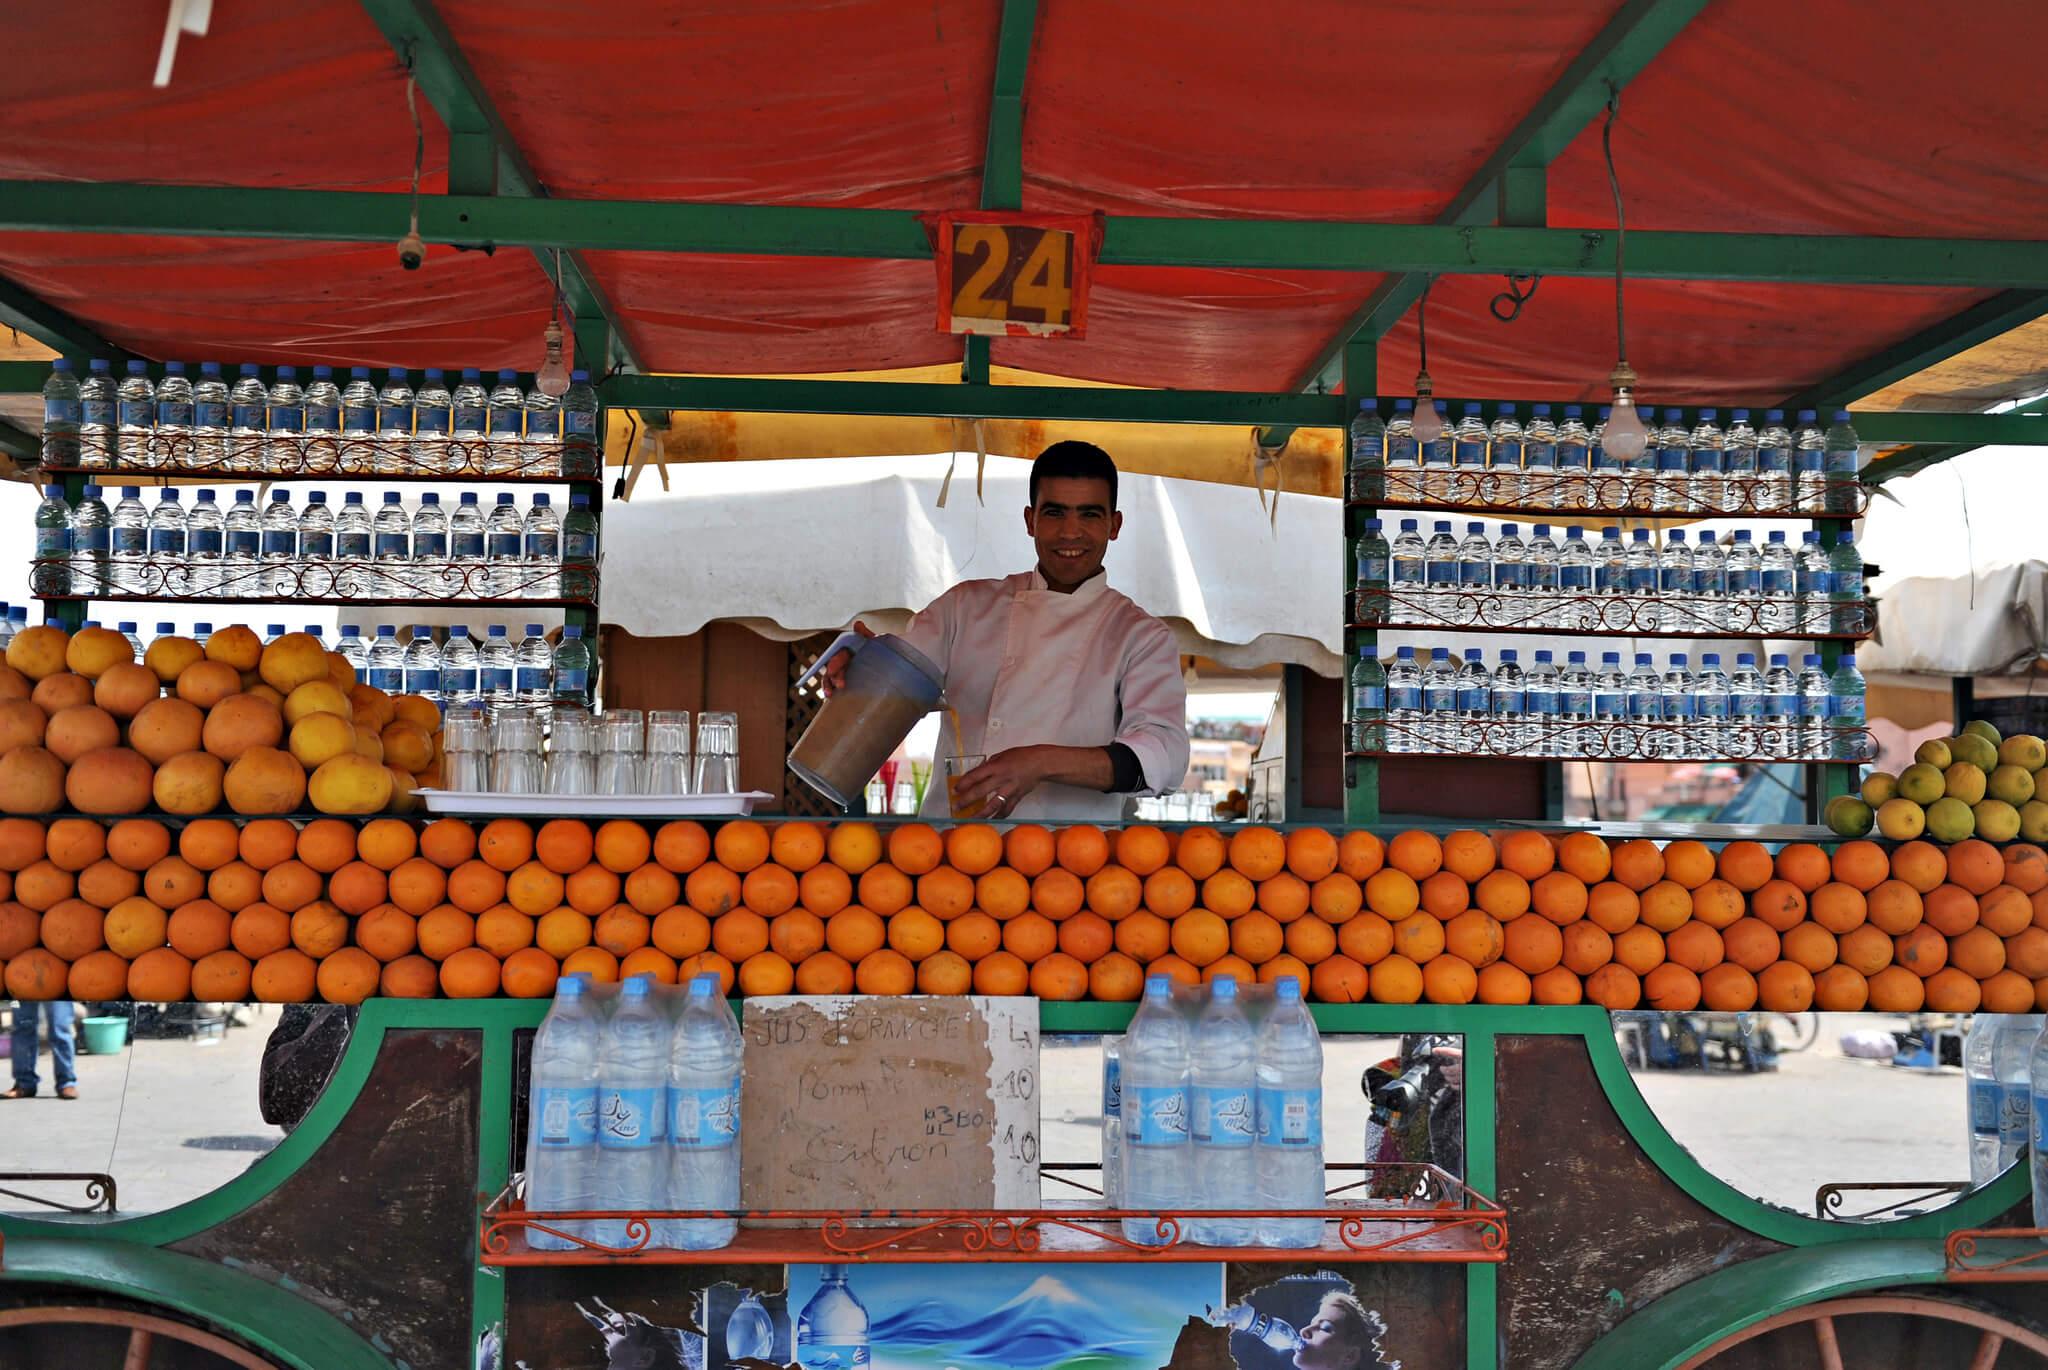 Jus d'oranges place Jemaa el Fna